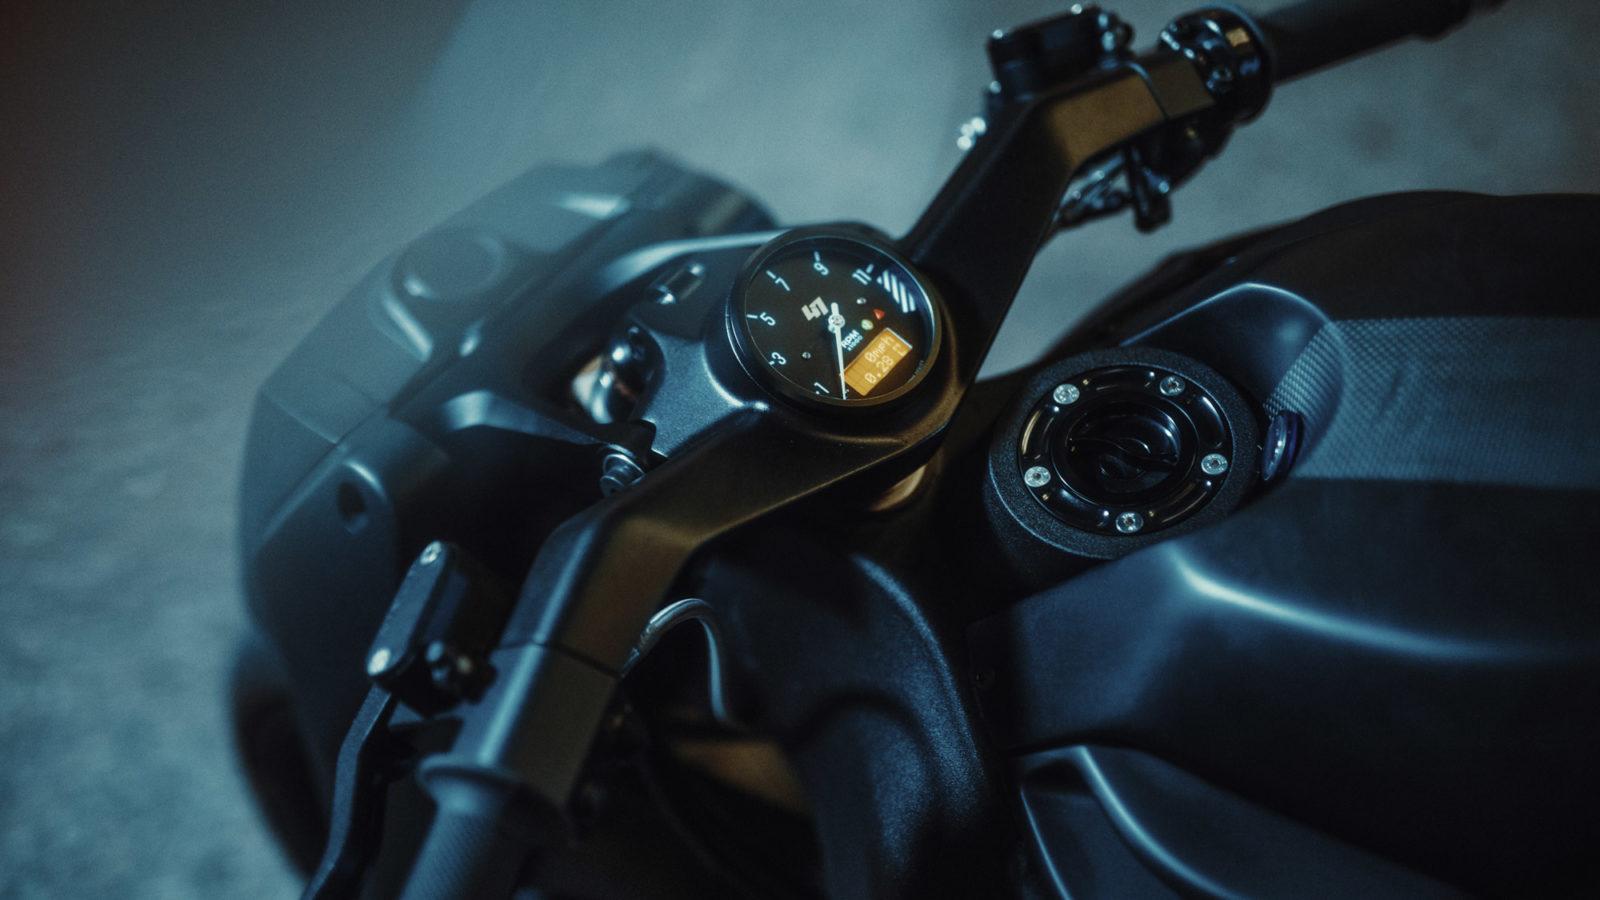 Deanbradshaw Ronin Motorcycle1